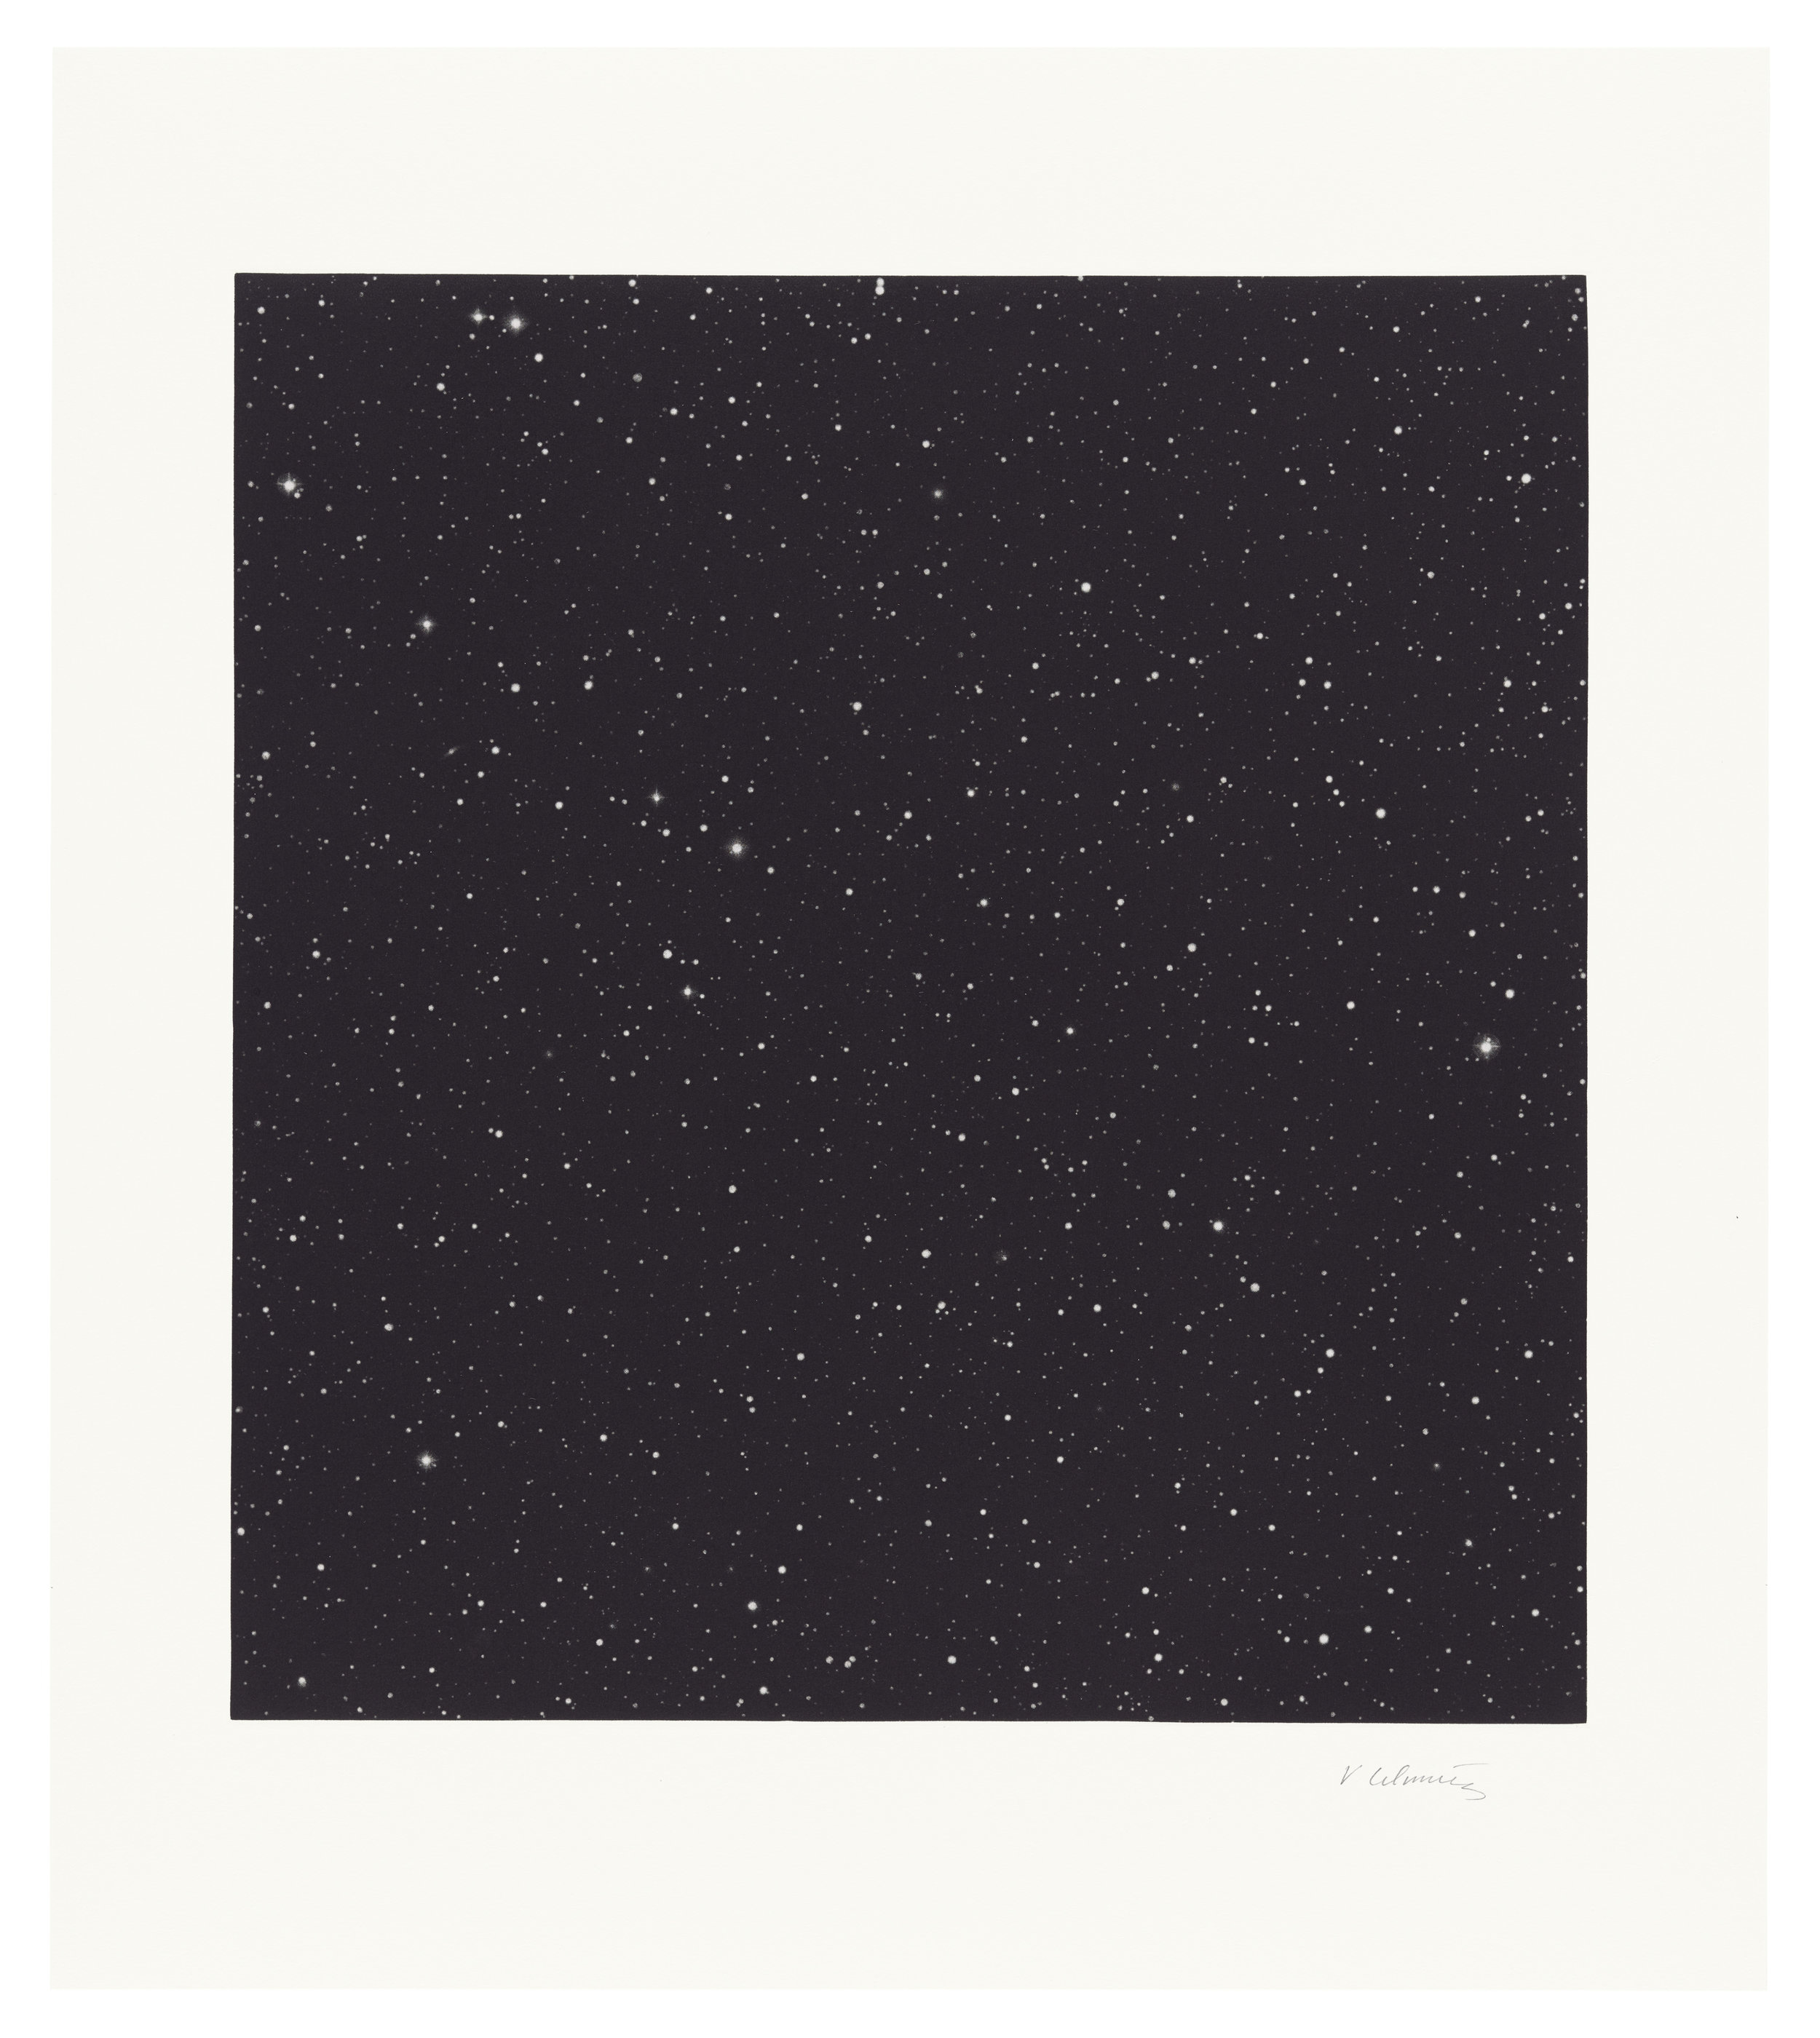 Vija Celmins (Latvian-born American, b. 1938)  Untitled (Dark Sky 1) , 2016 mezzotint on Hahnemuhle paper 22 1/2 x 19 inches (54.6 x 48.3 cm)